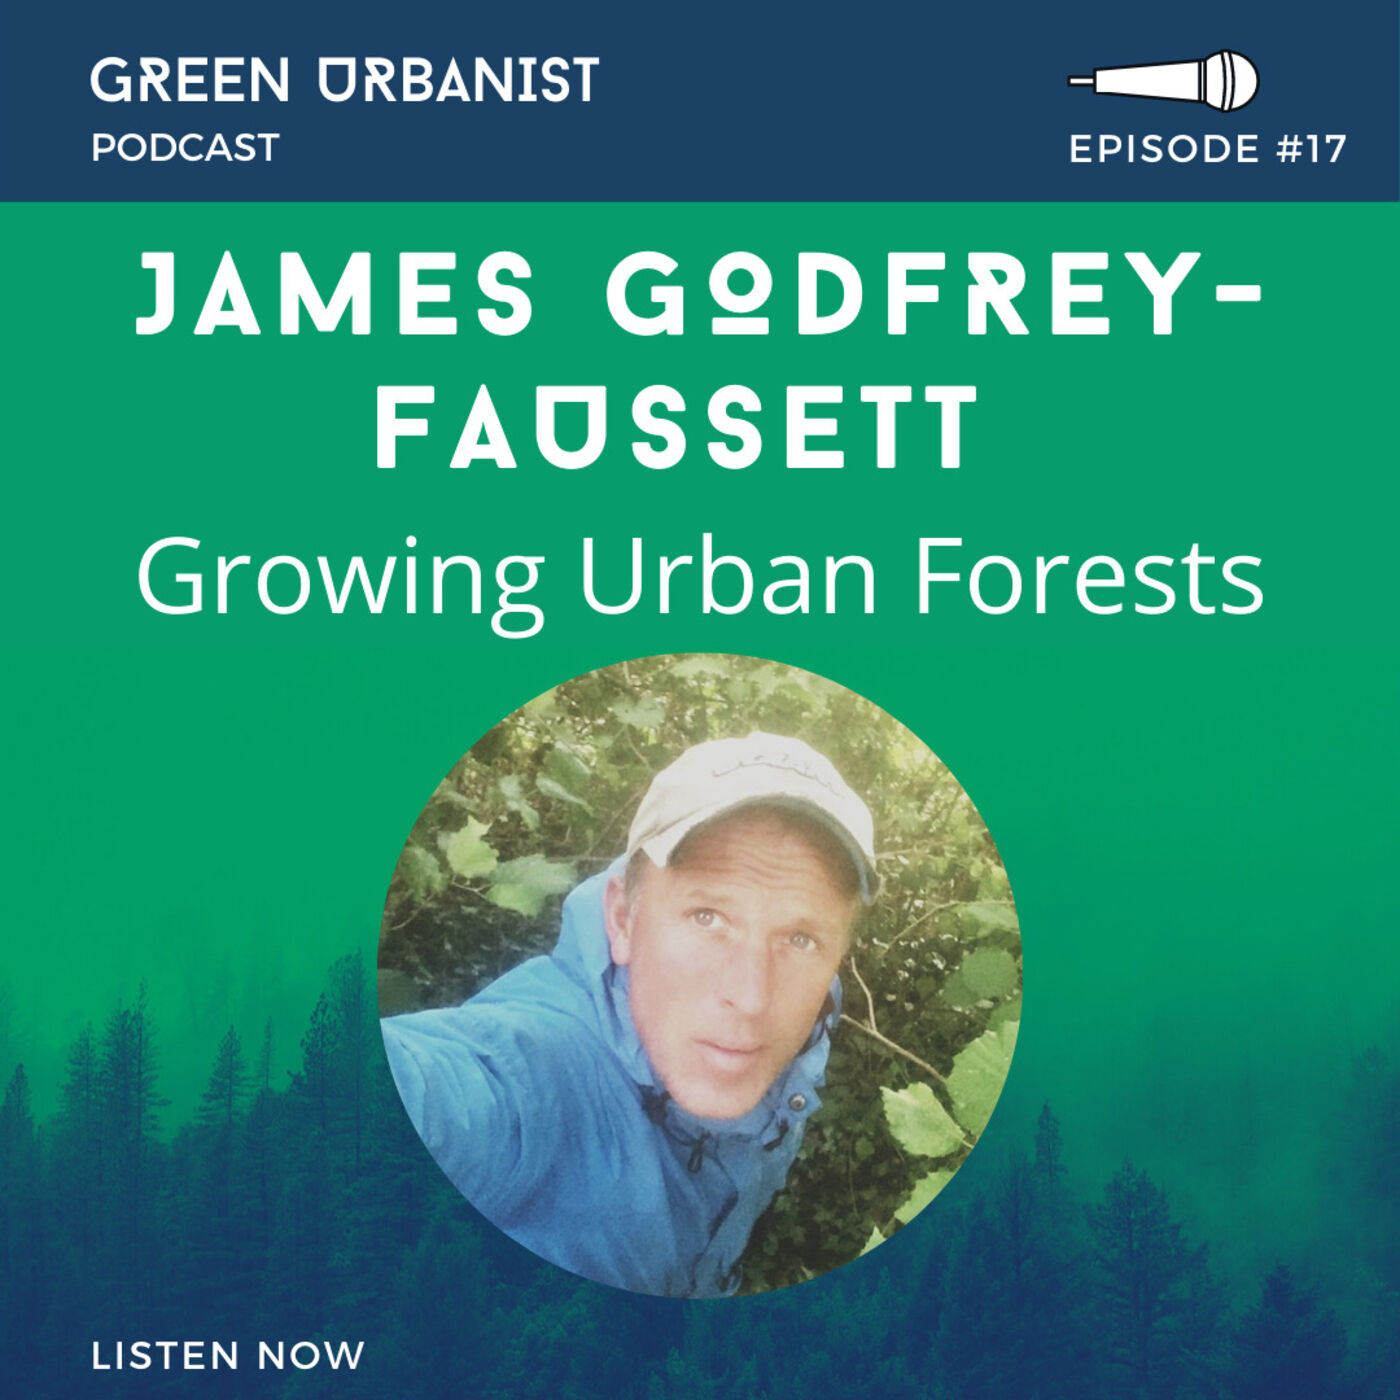 #17: James Godfrey-Faussett - Growing Urban Forests with the Miyawaki Method